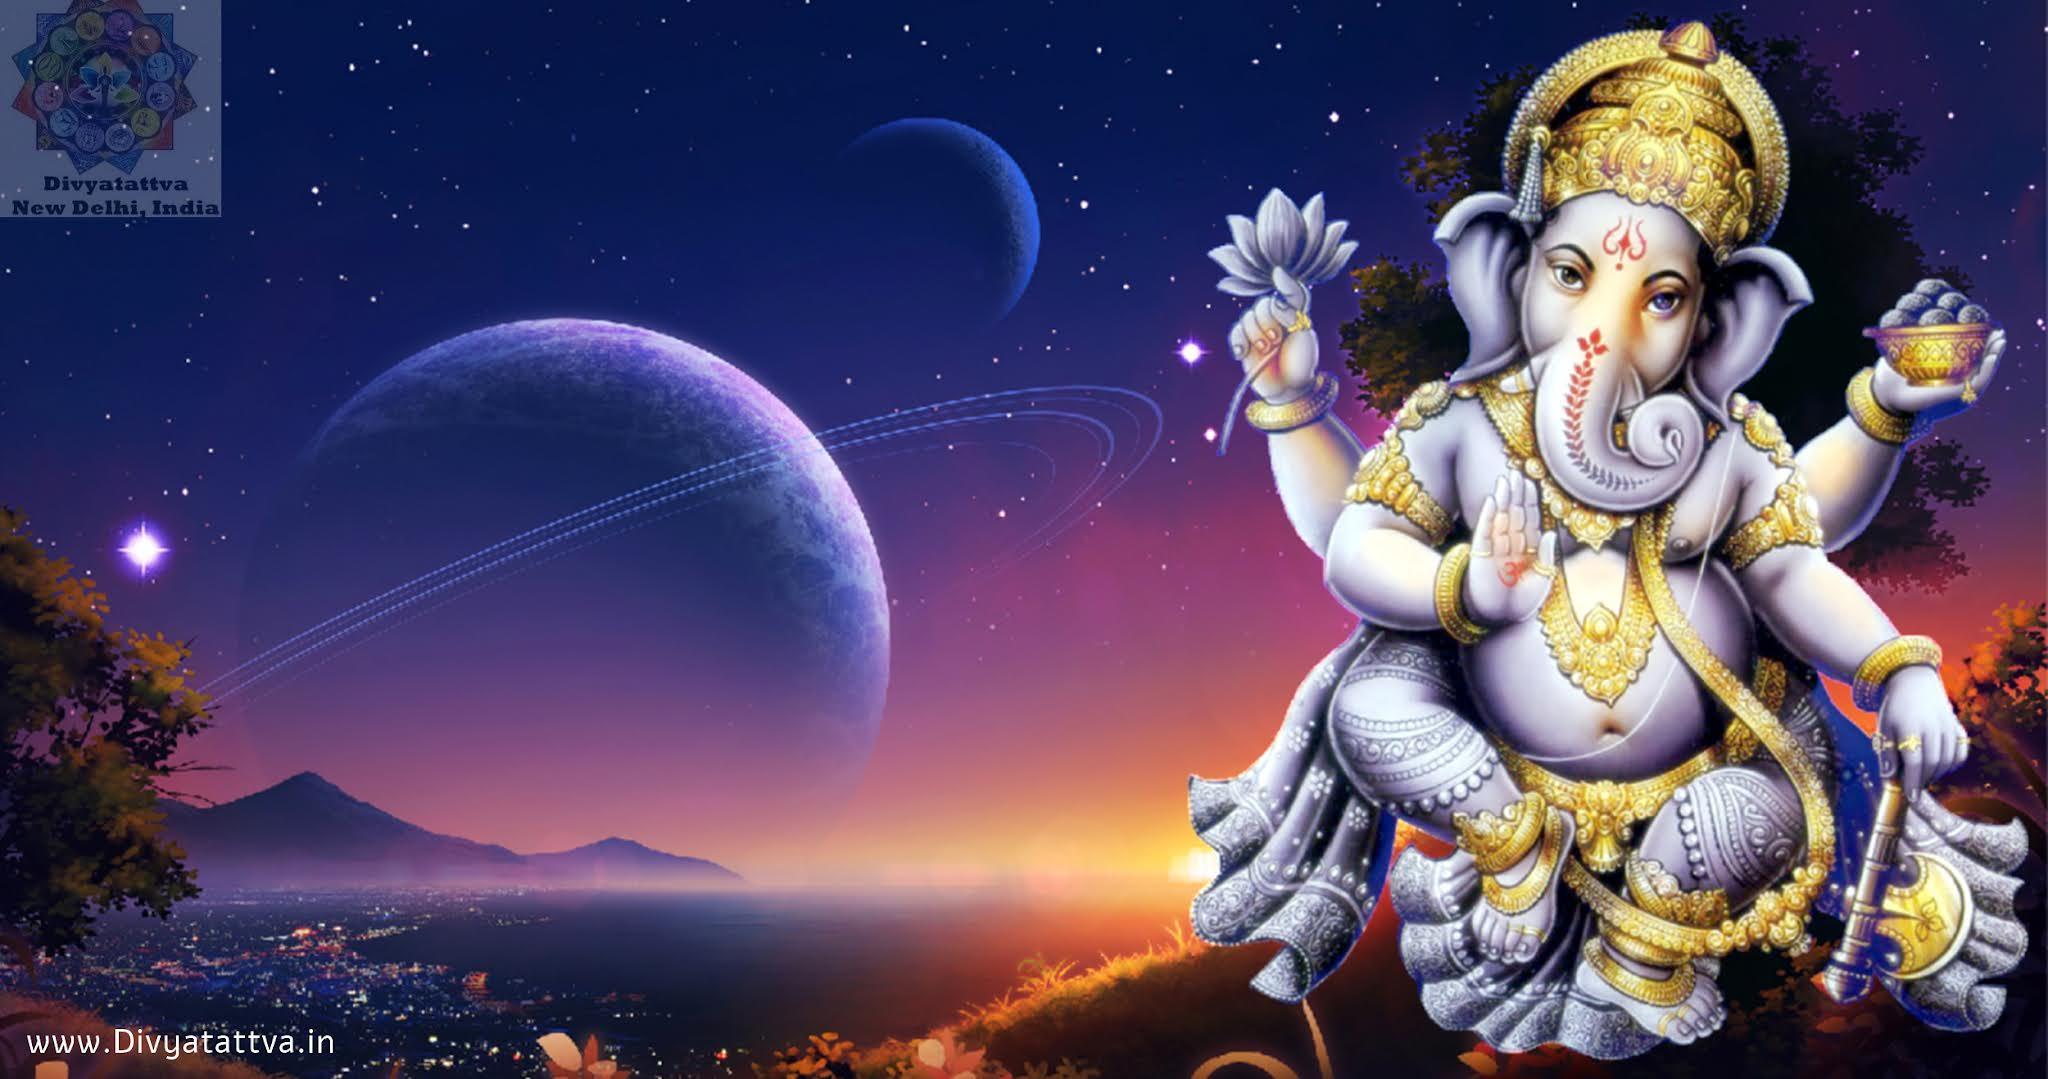 Lord Ganesha Mantras in Sanskrit Hindi For Wealth Prosperity